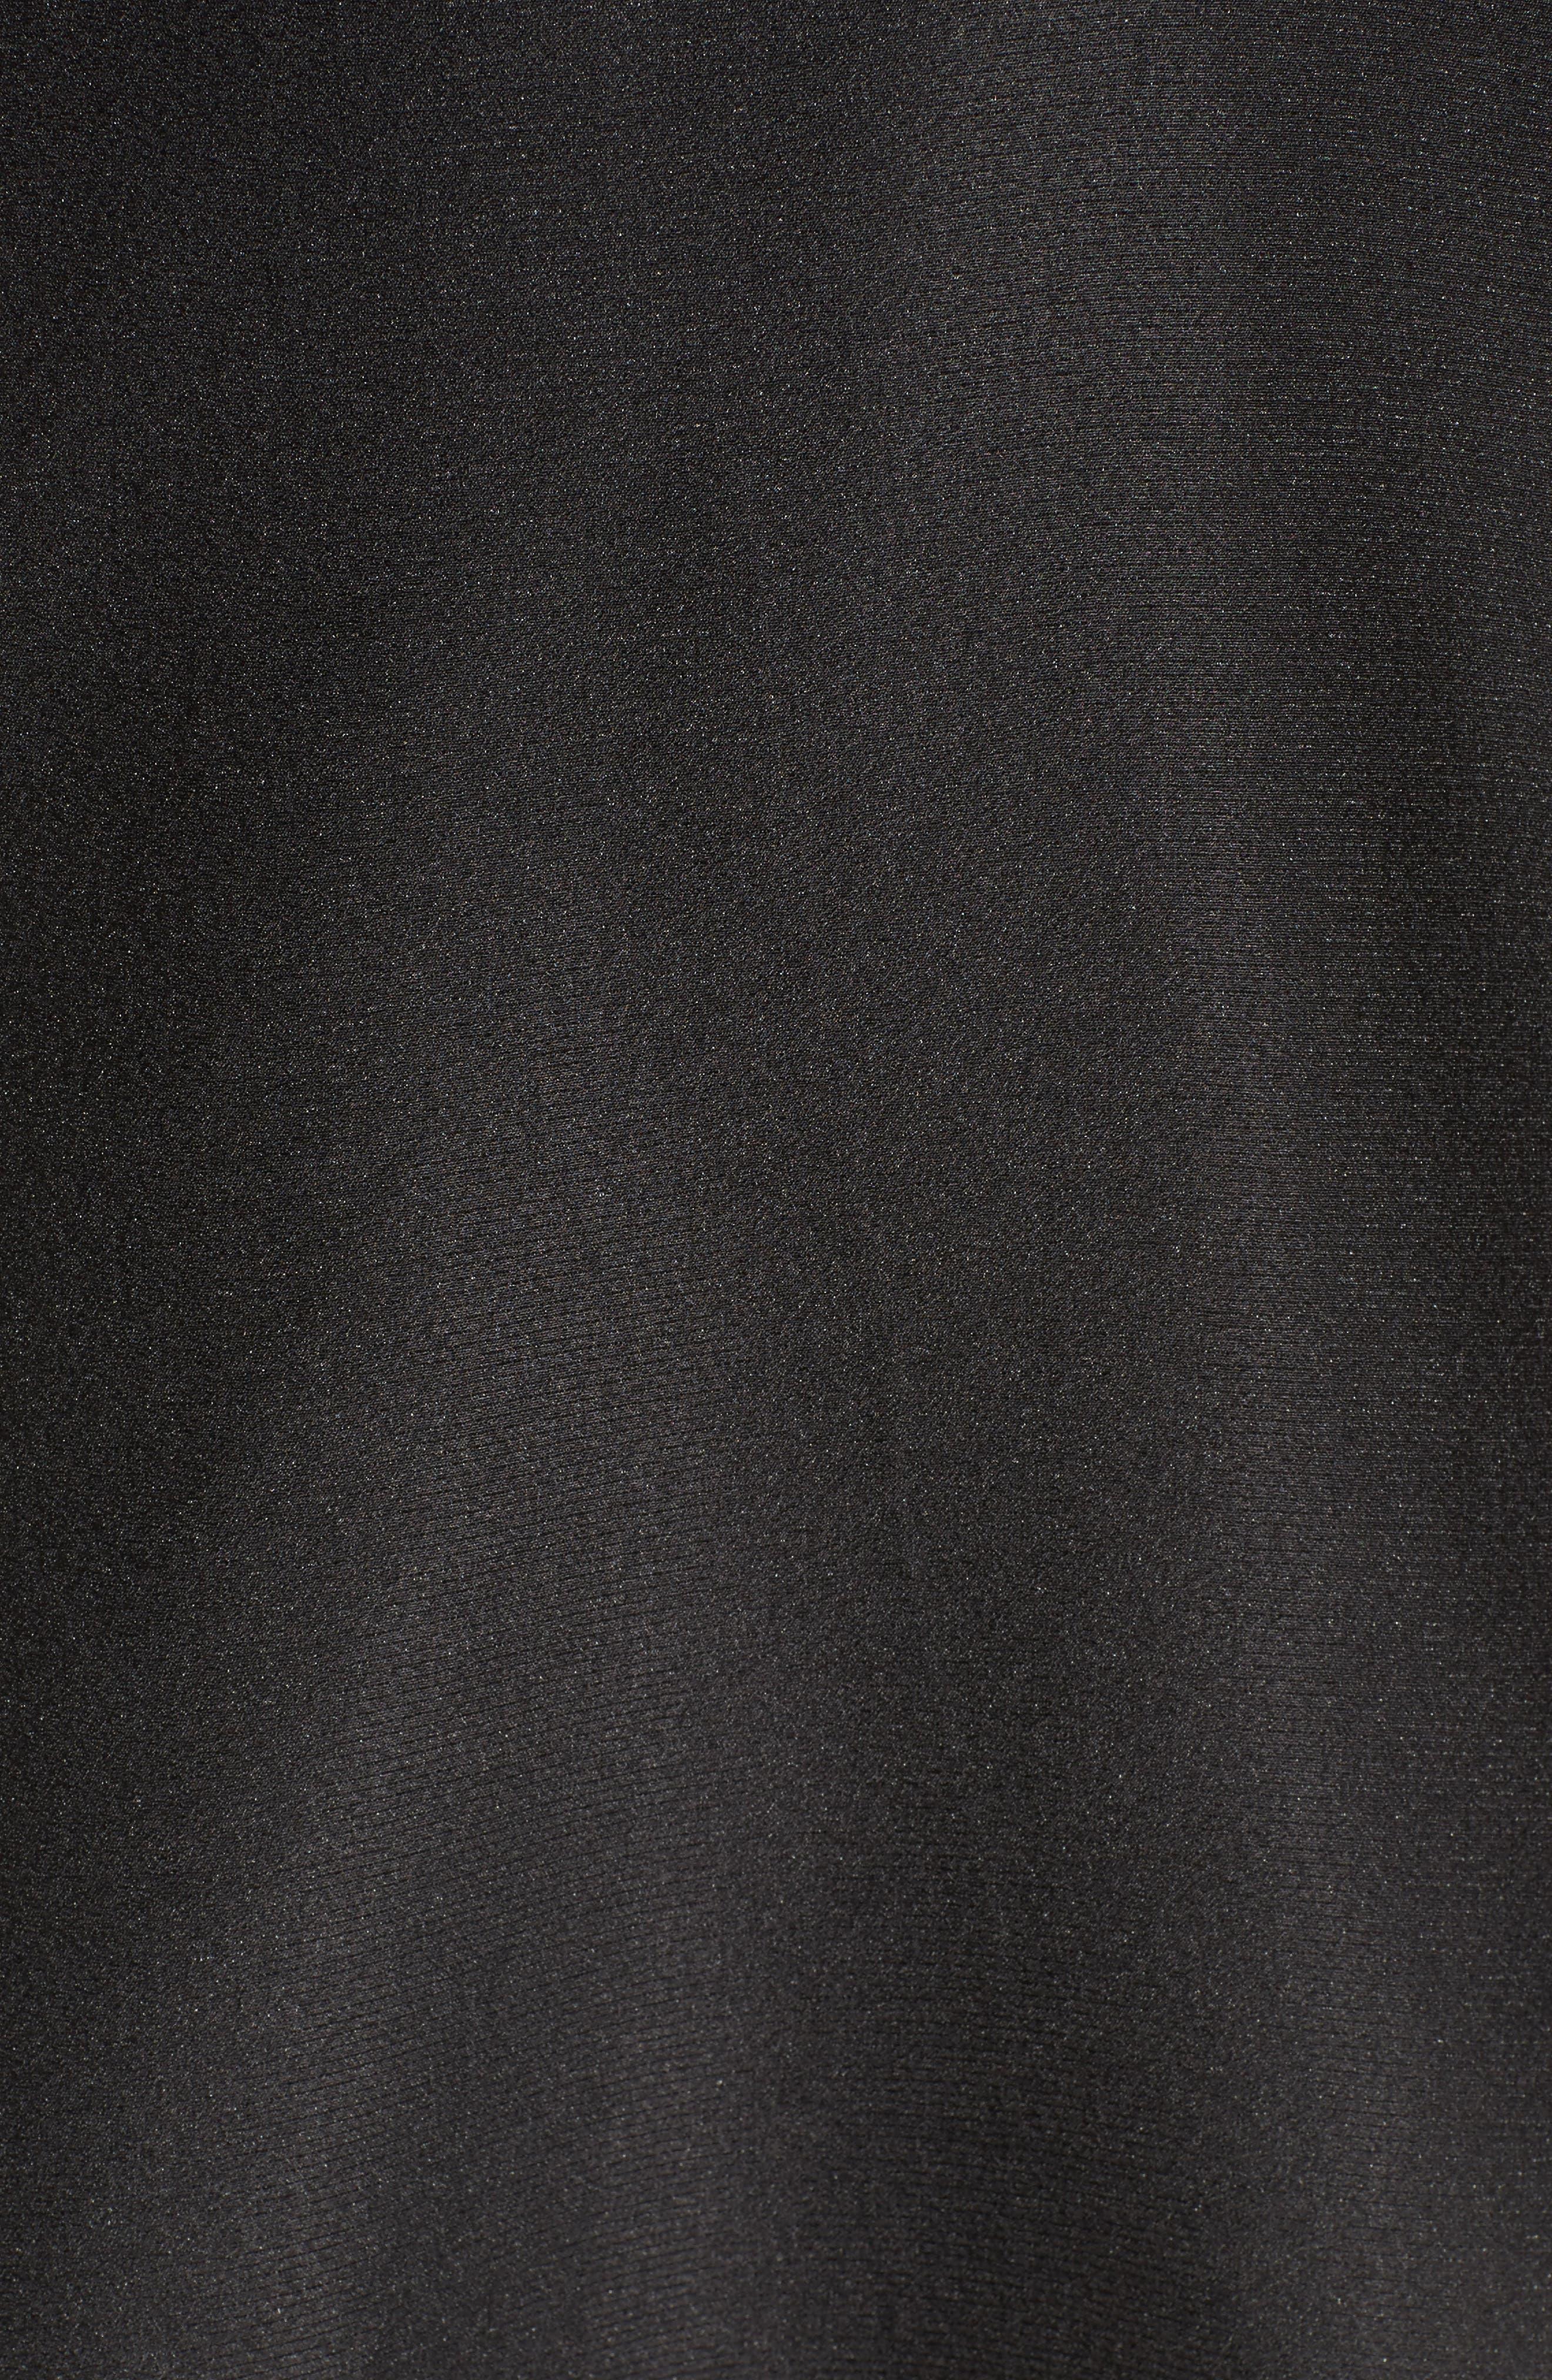 Call Me Strapless Dress,                             Alternate thumbnail 6, color,                             Black